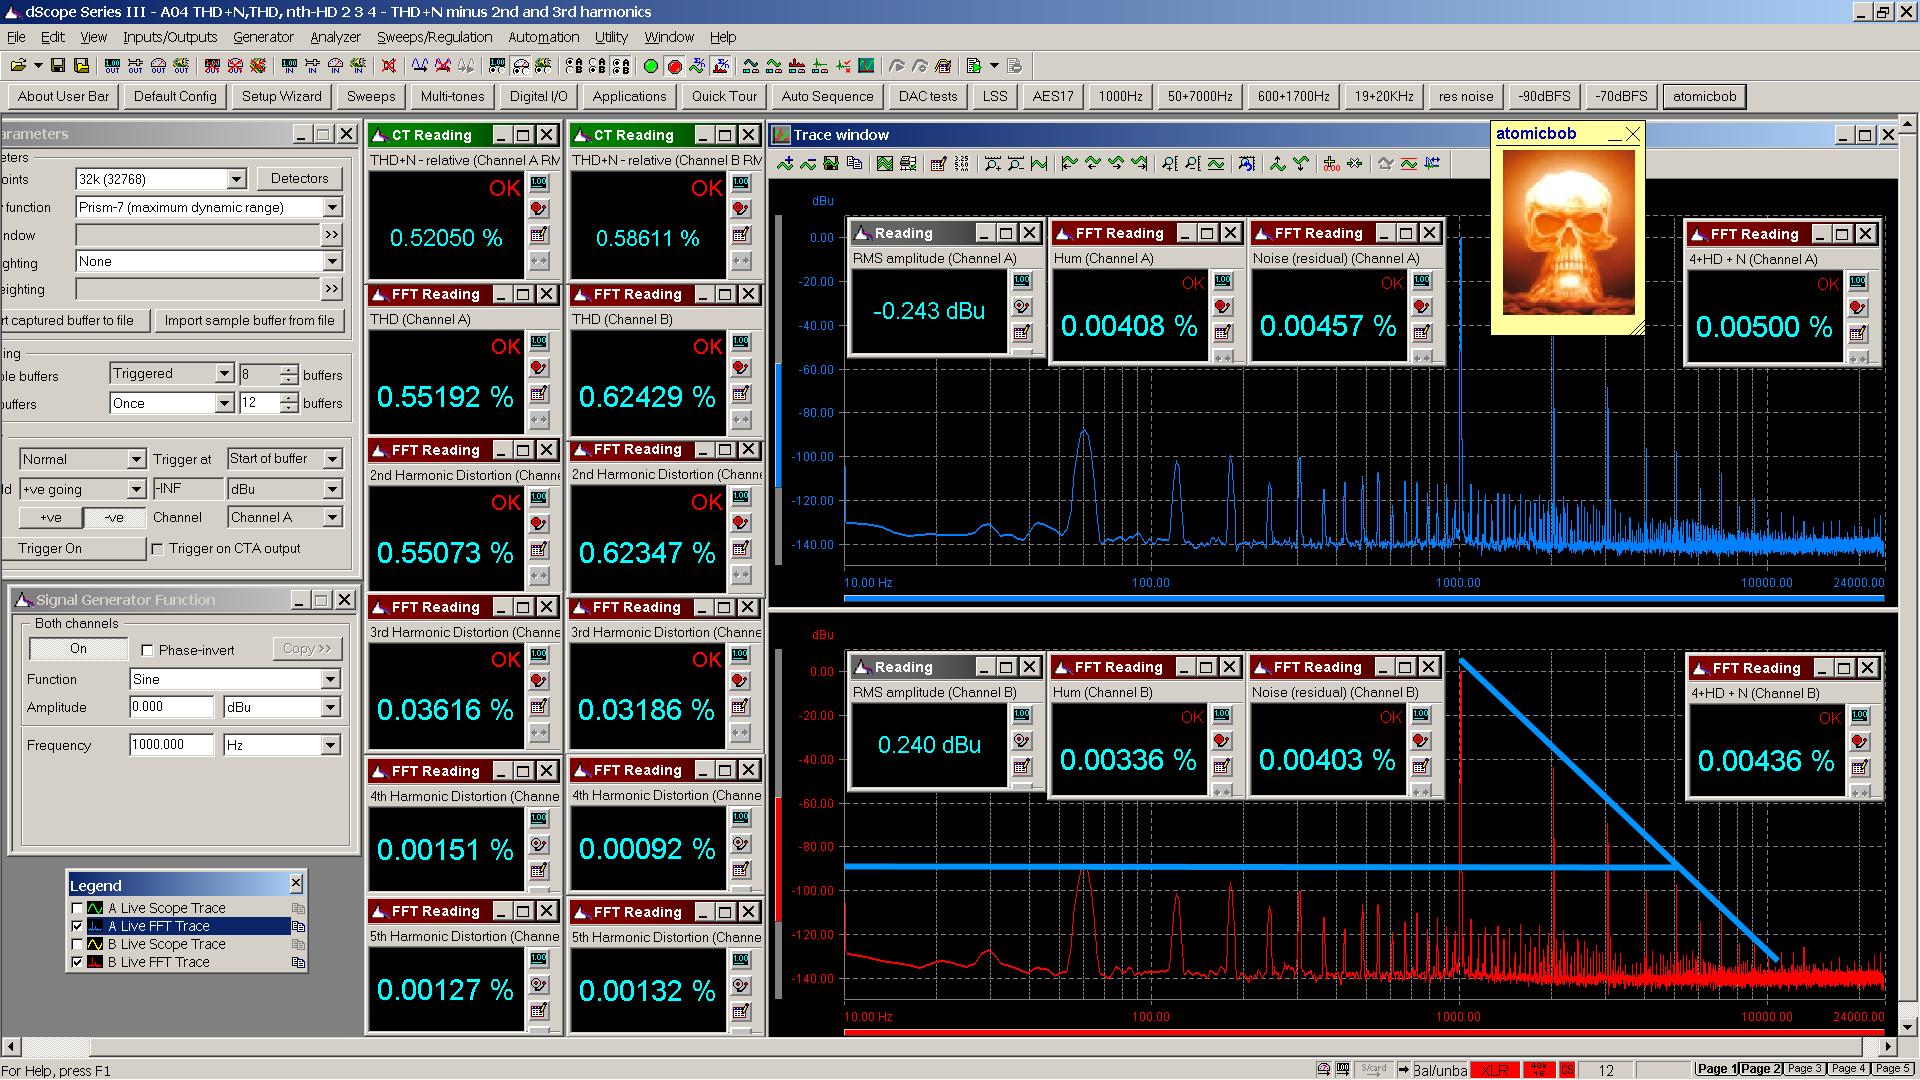 20190930-7 SW51+ 6Z51P A04 THD+N  THD  nth-HD FFT 300R HiZ - 4+HD+N with 60Hz 0dBu - slope+noise.png